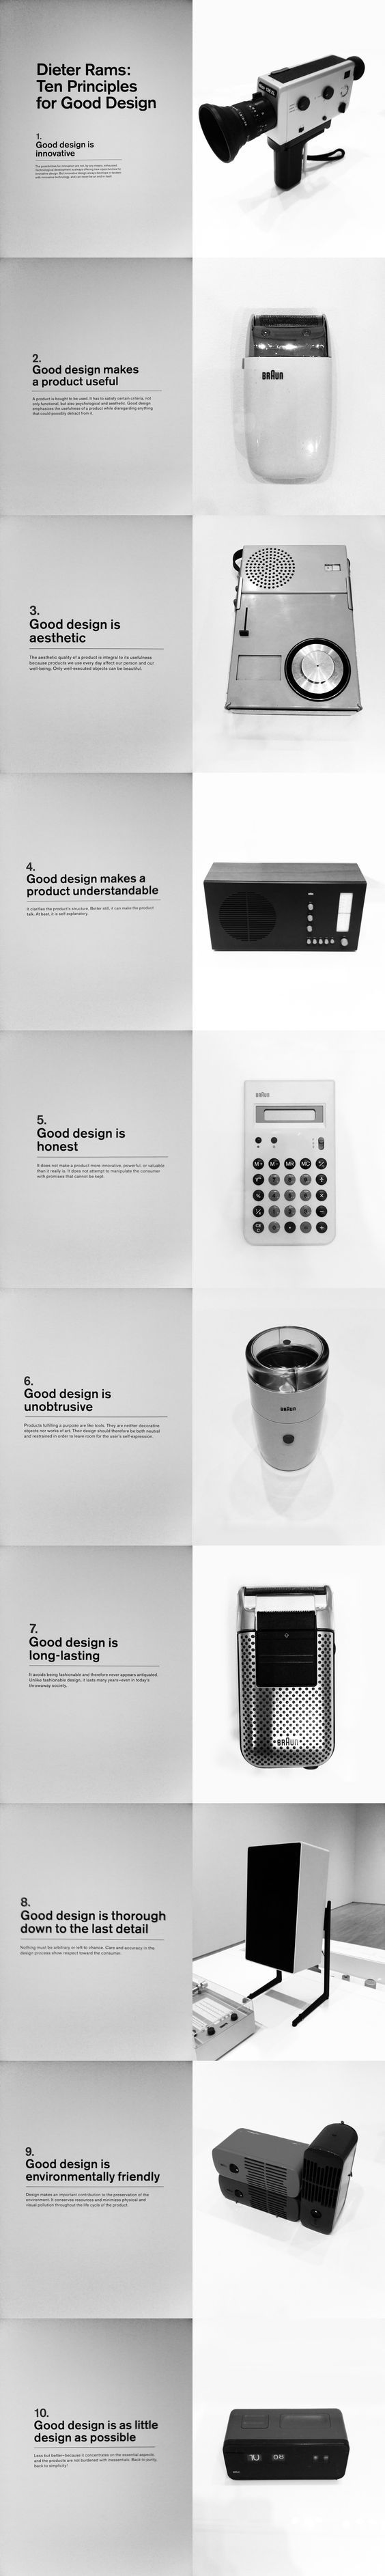 34 Best Collection Images On Pinterest Product Design Super 8